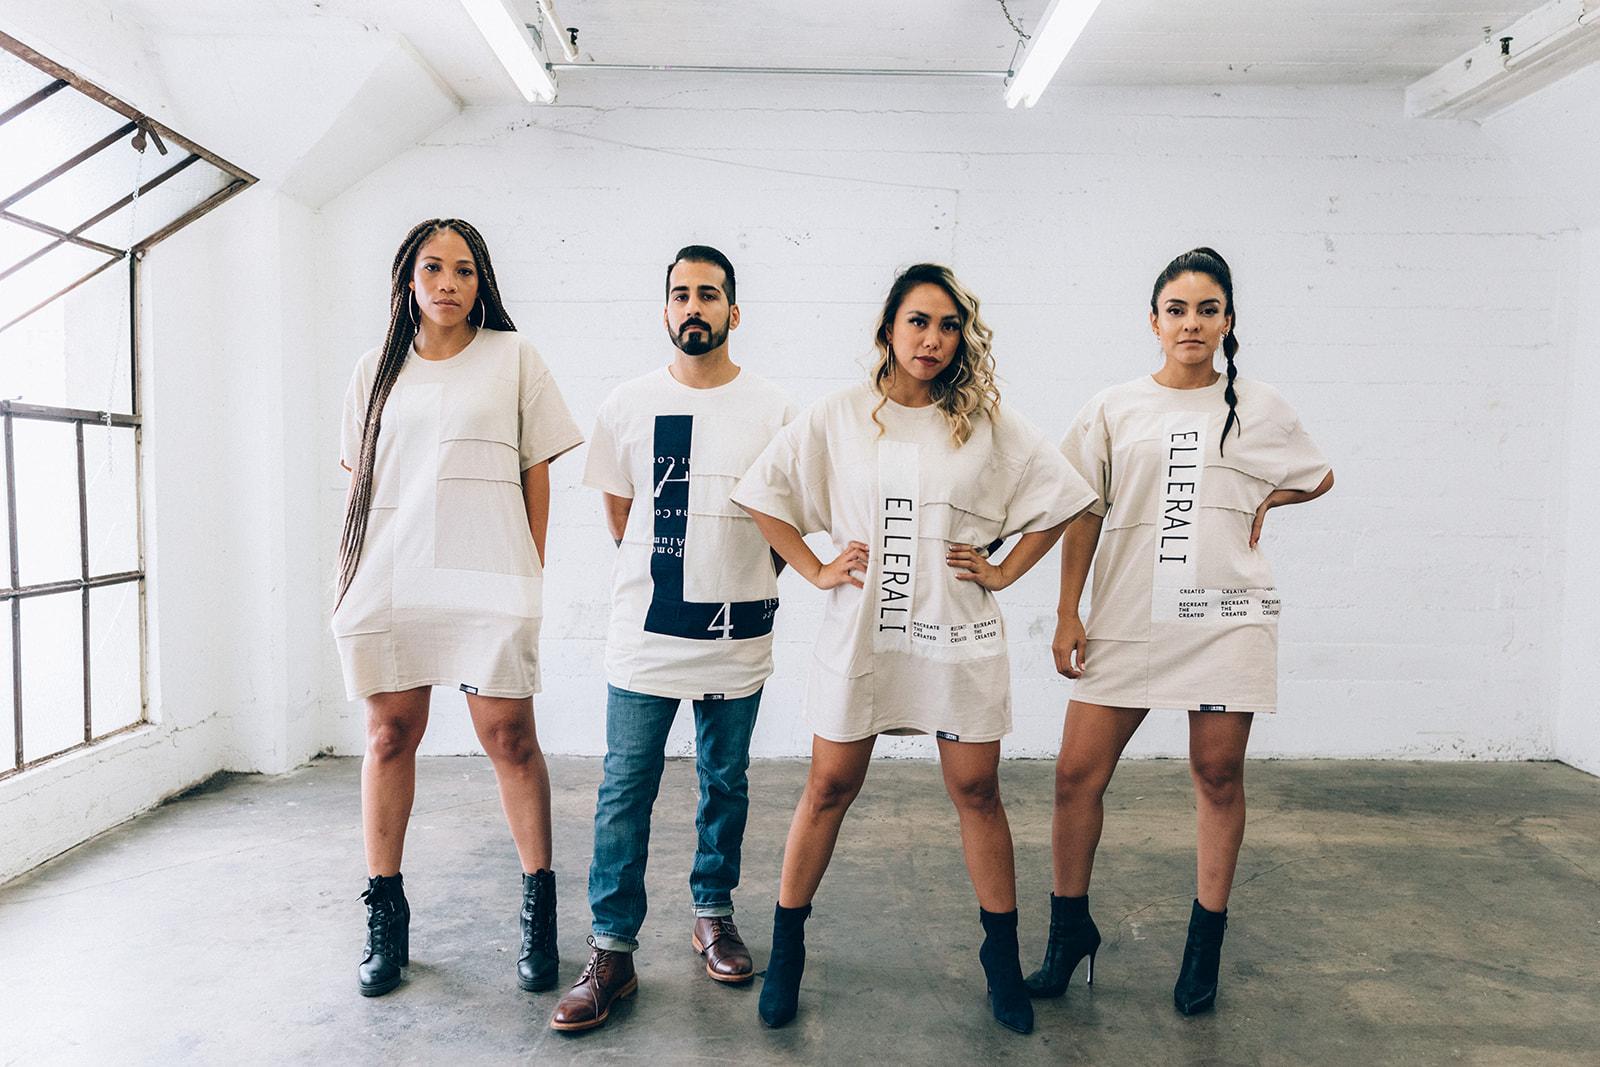 Off White Not Basic T-shirt - Gender Neutral, Pockets, Fresh, Upcycled.